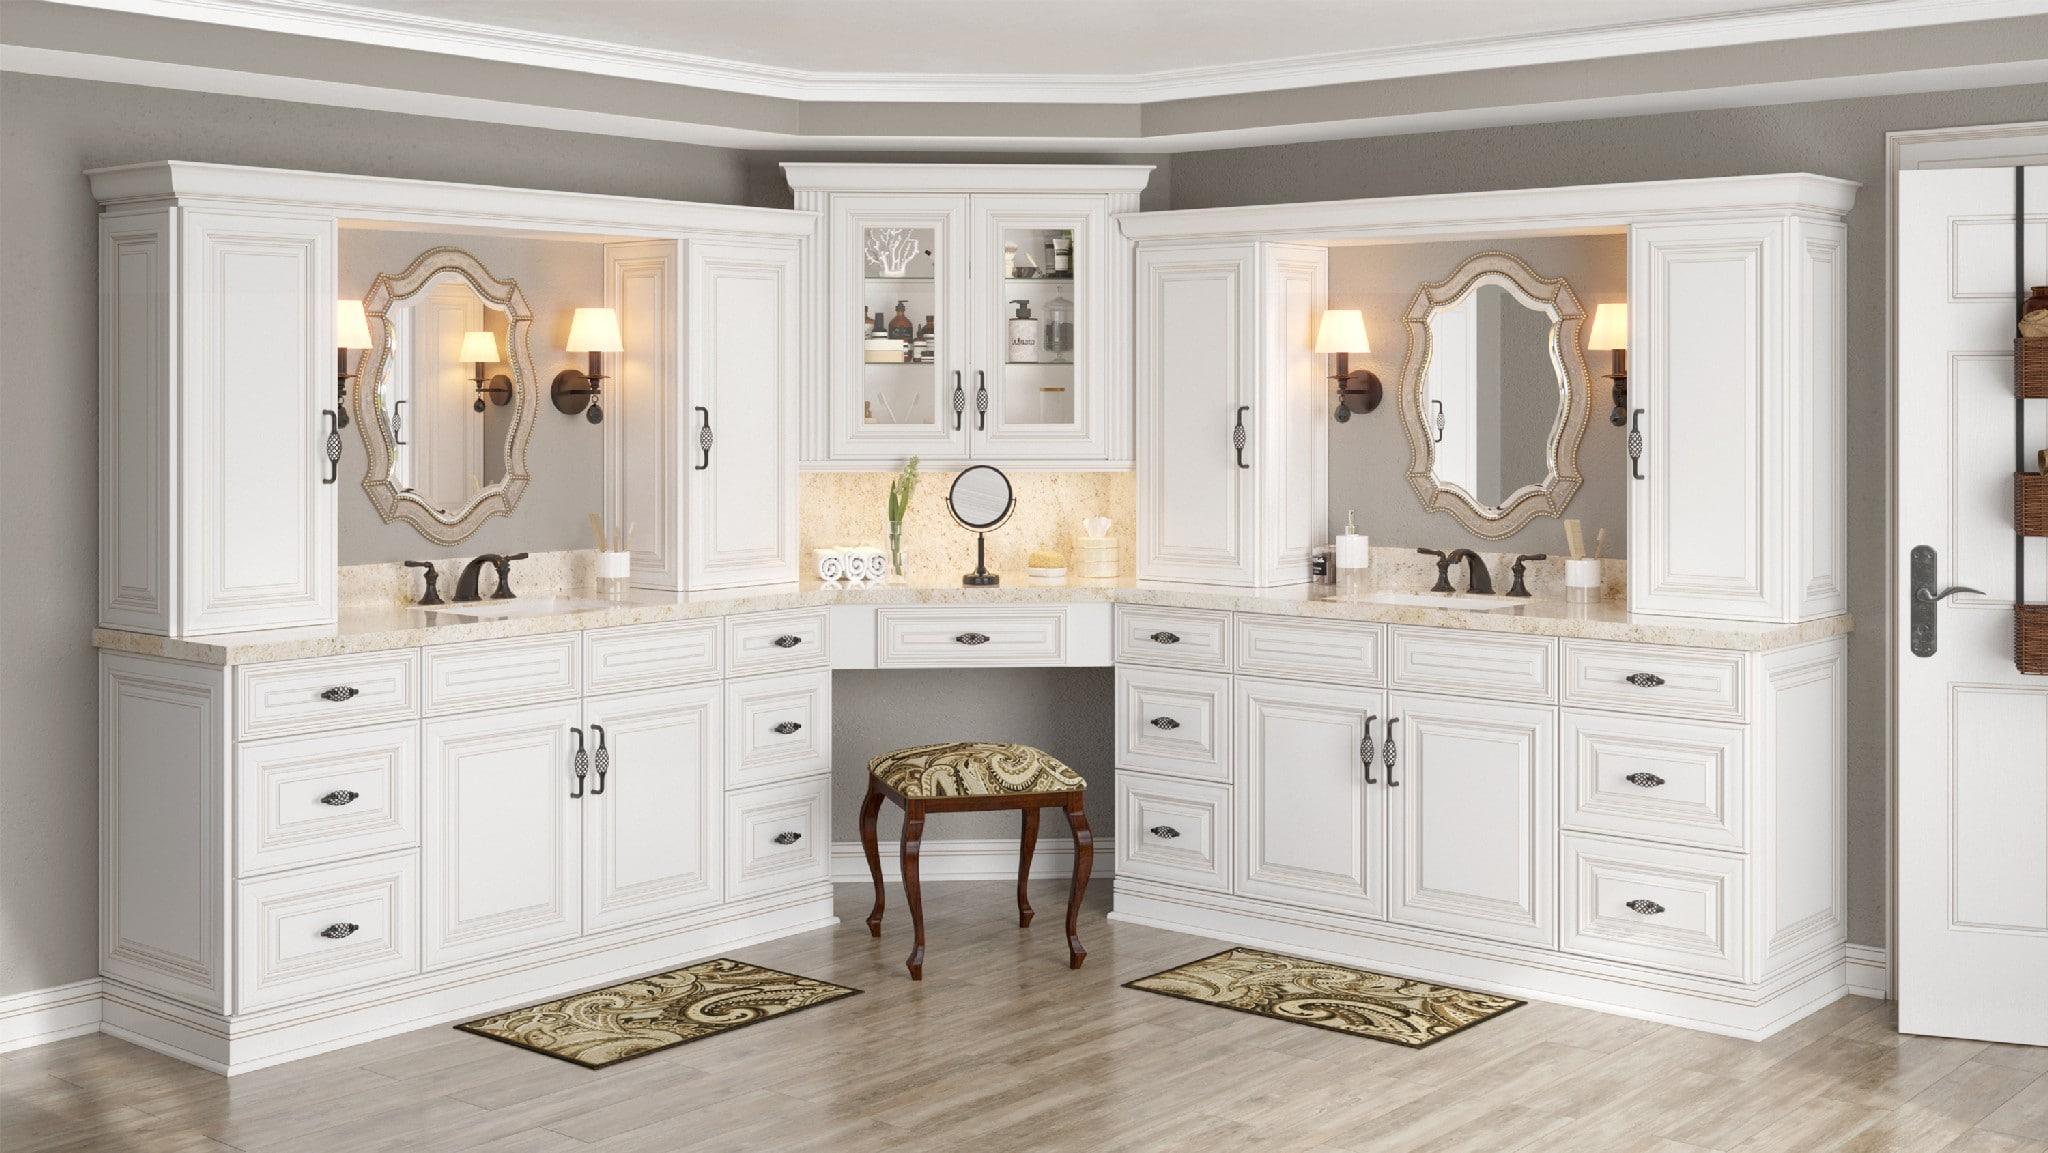 Best Bathroom Design Company in Florida | STA Cabinet Depot